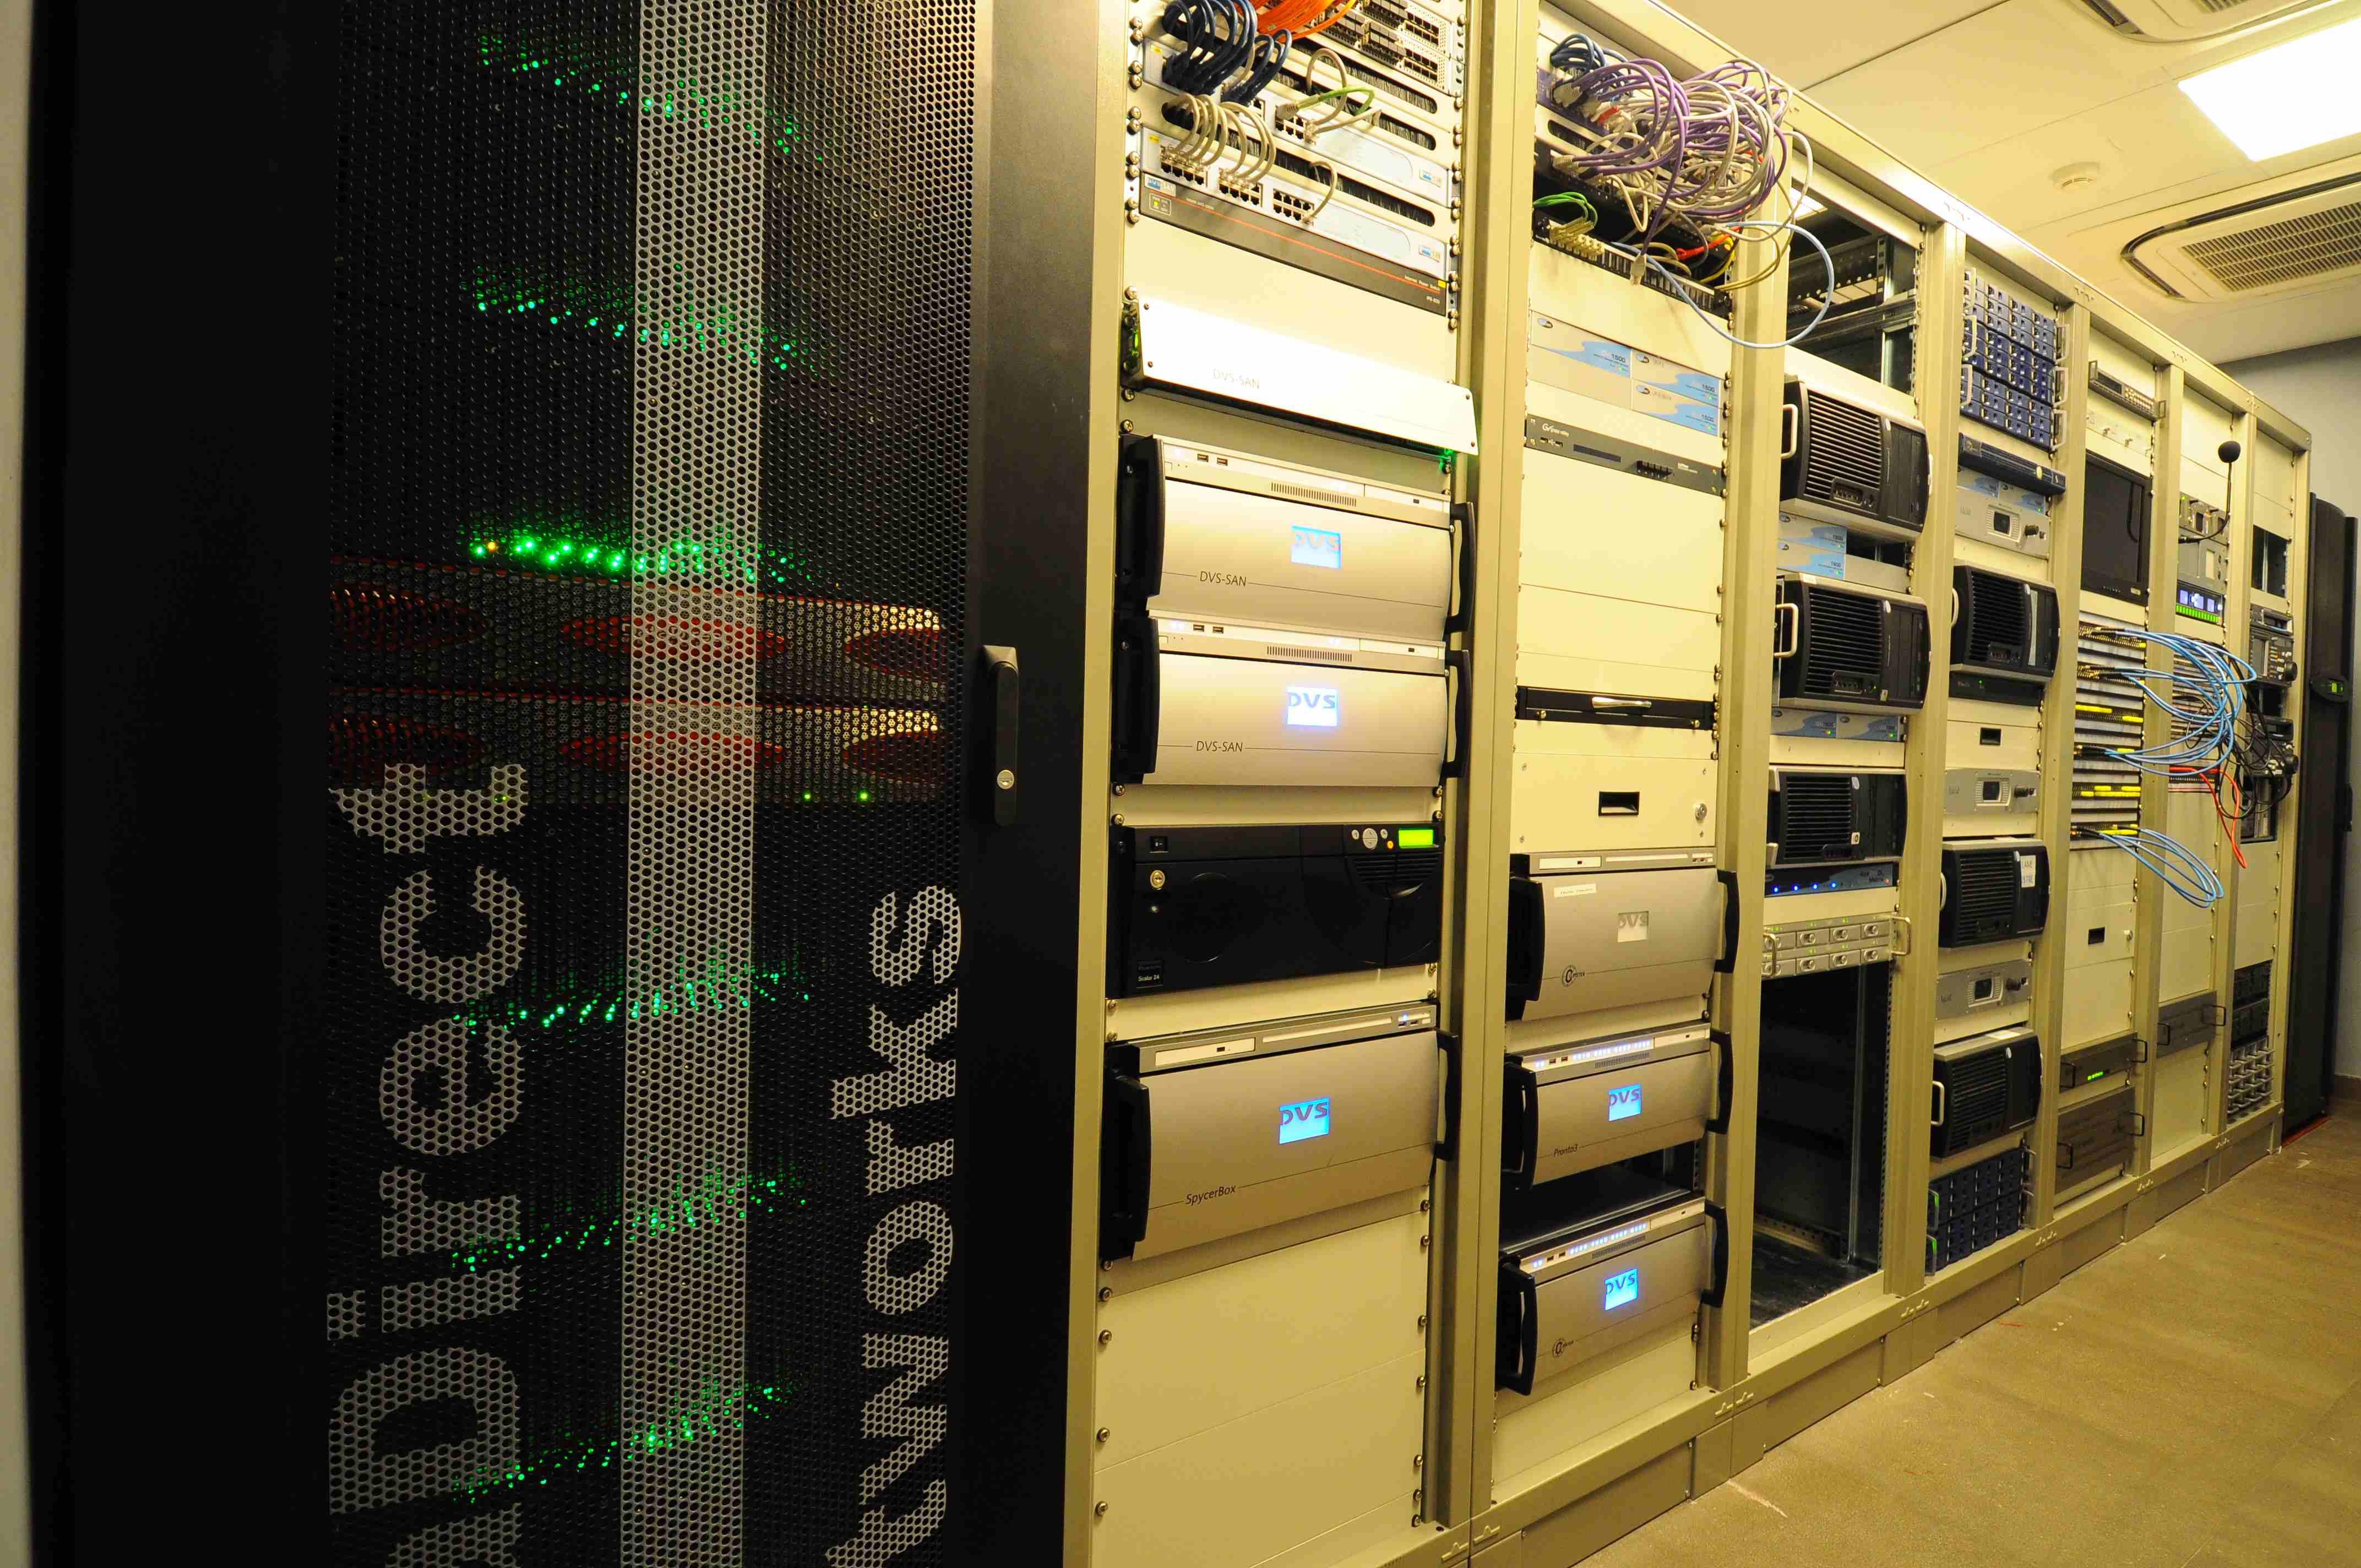 023 Sala Maquinas Video & Cine.JPG